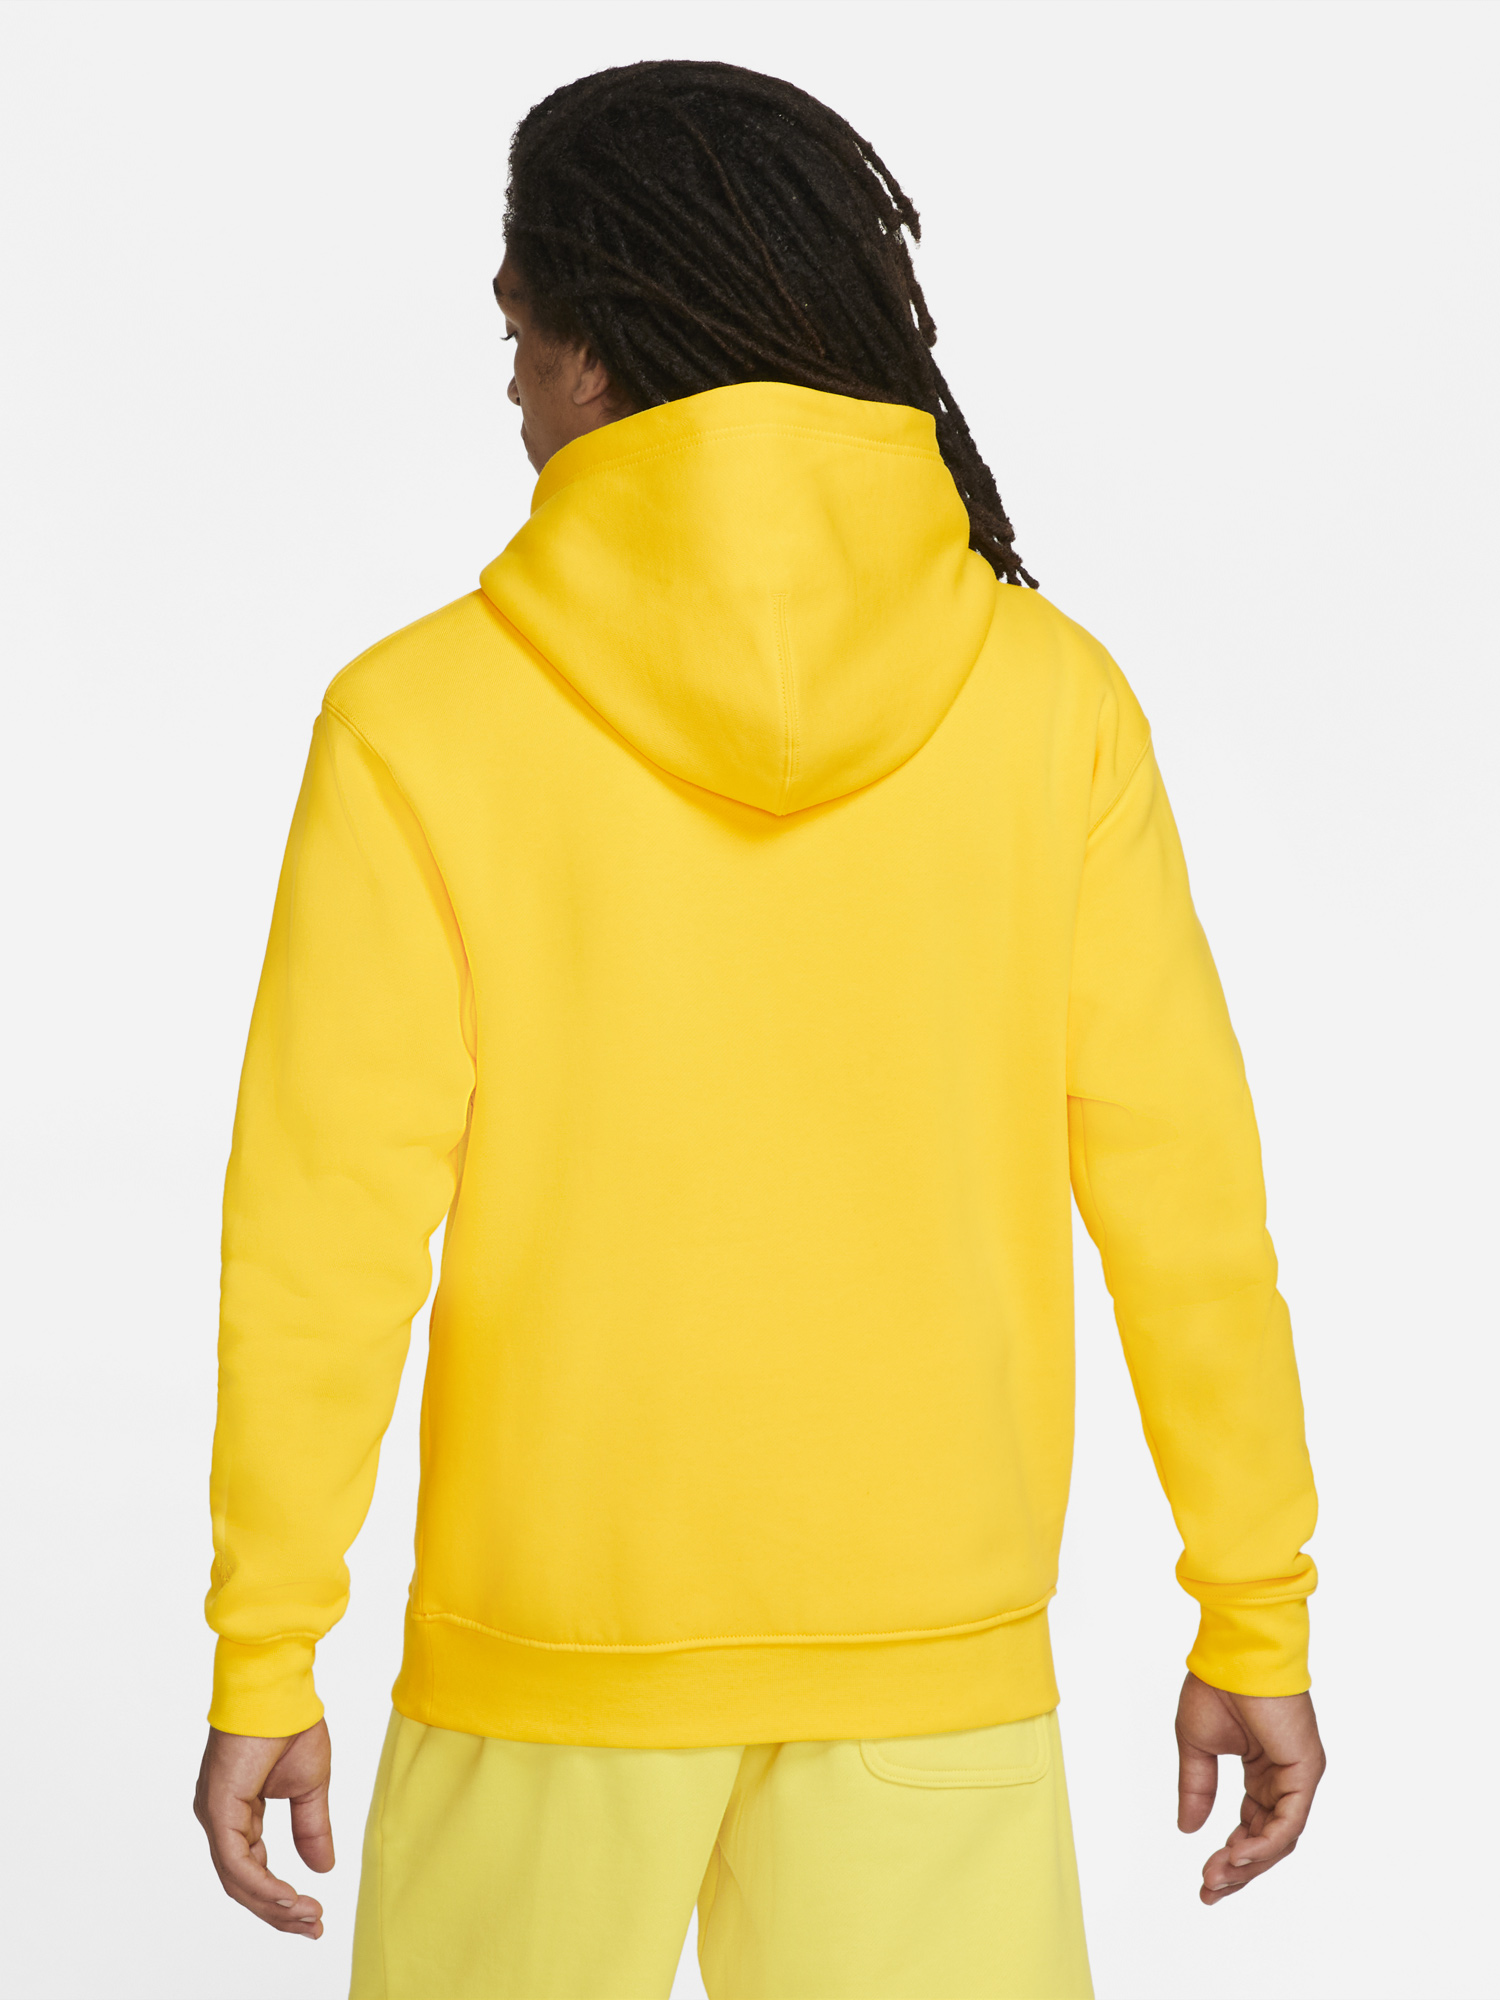 air-jordan-4-lightning-yellow-hoodie-1